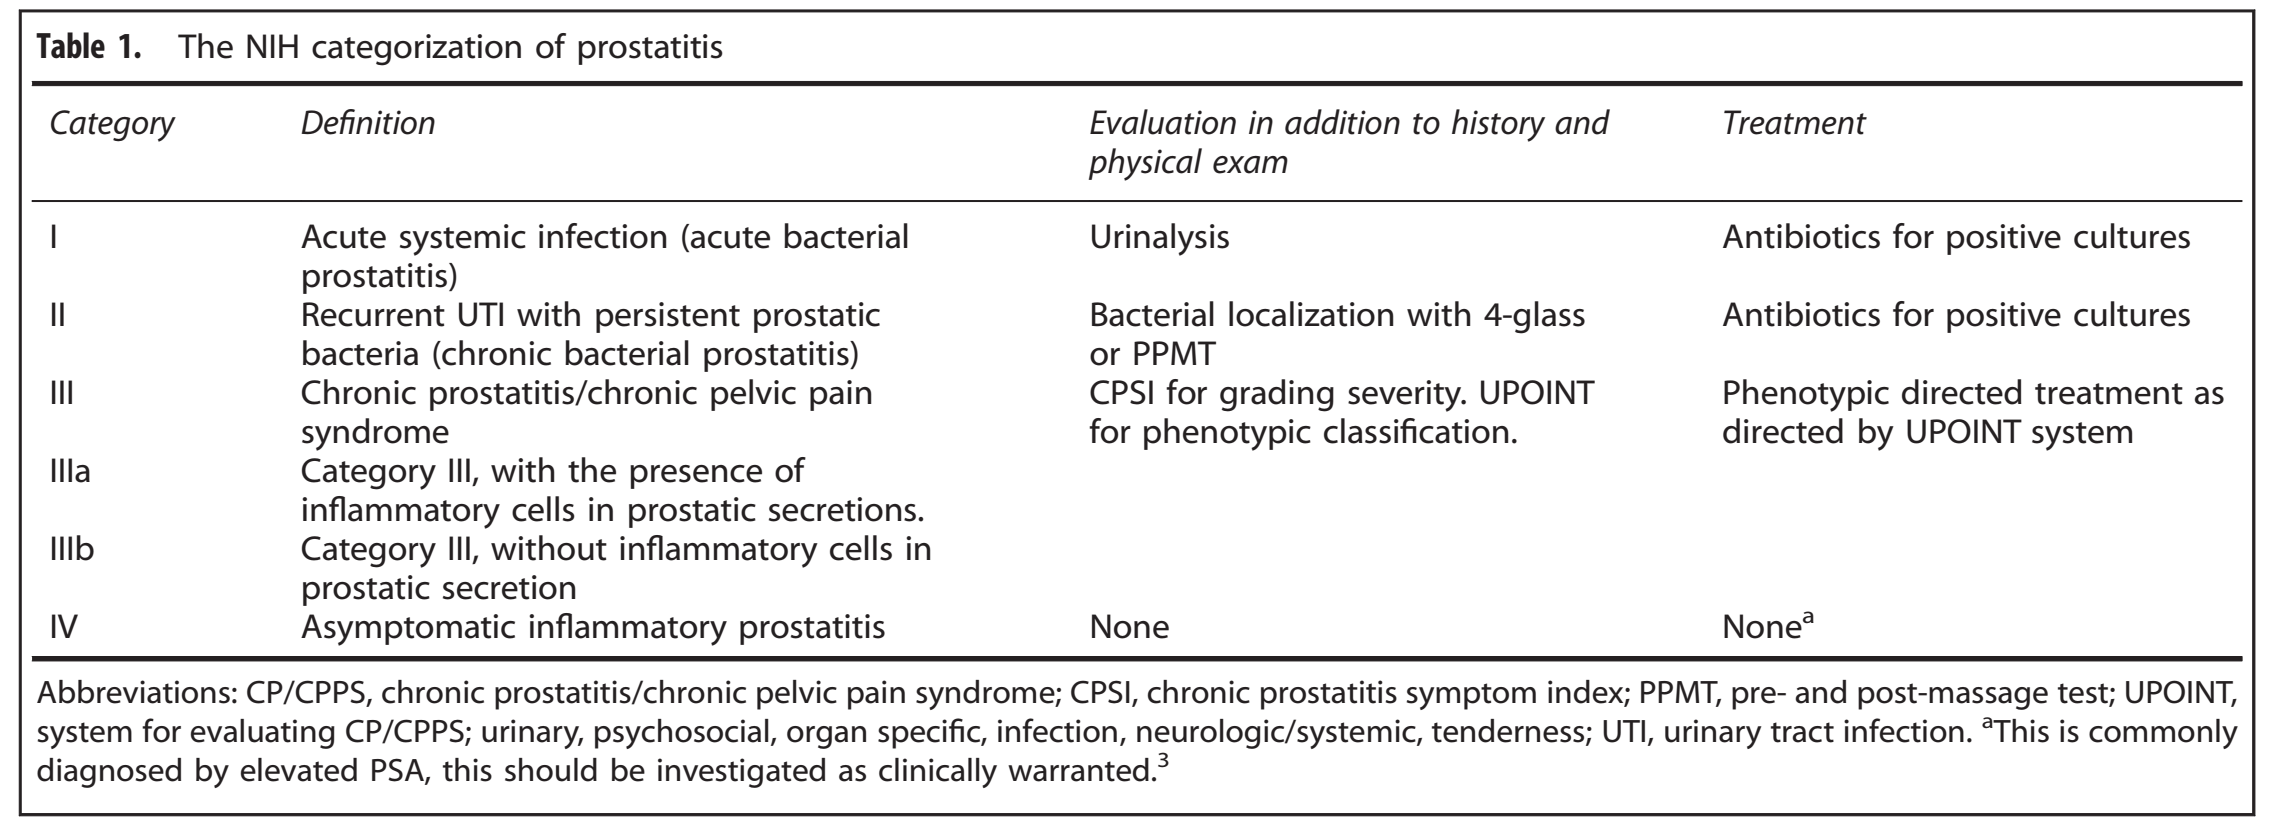 sintomas de prostatitis aguda